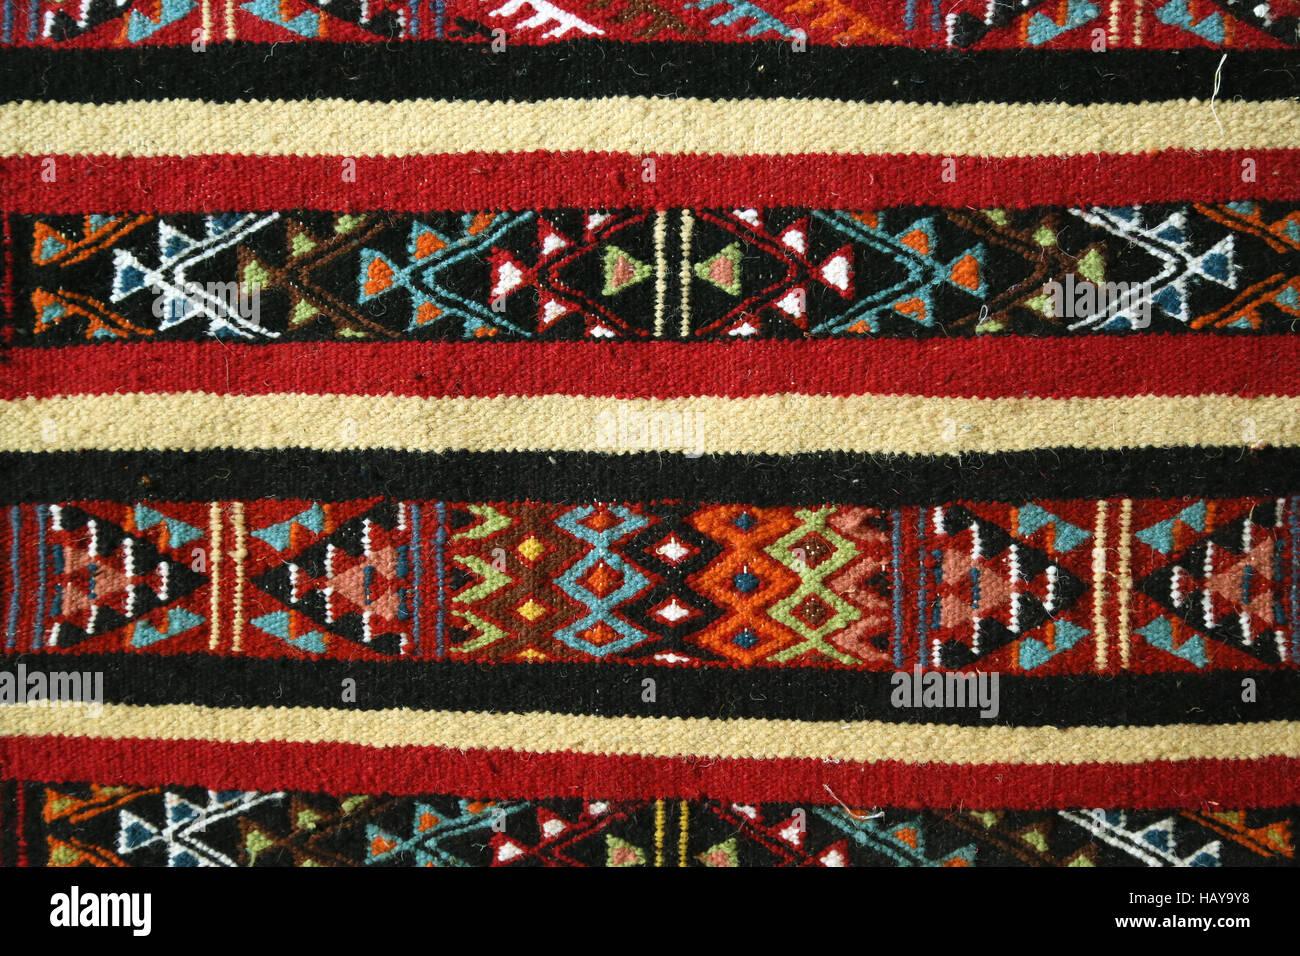 Traditional Tunisian Carpet Style Photos Traditional Tunisian - Faience cuisine et tapis berbere tunisien